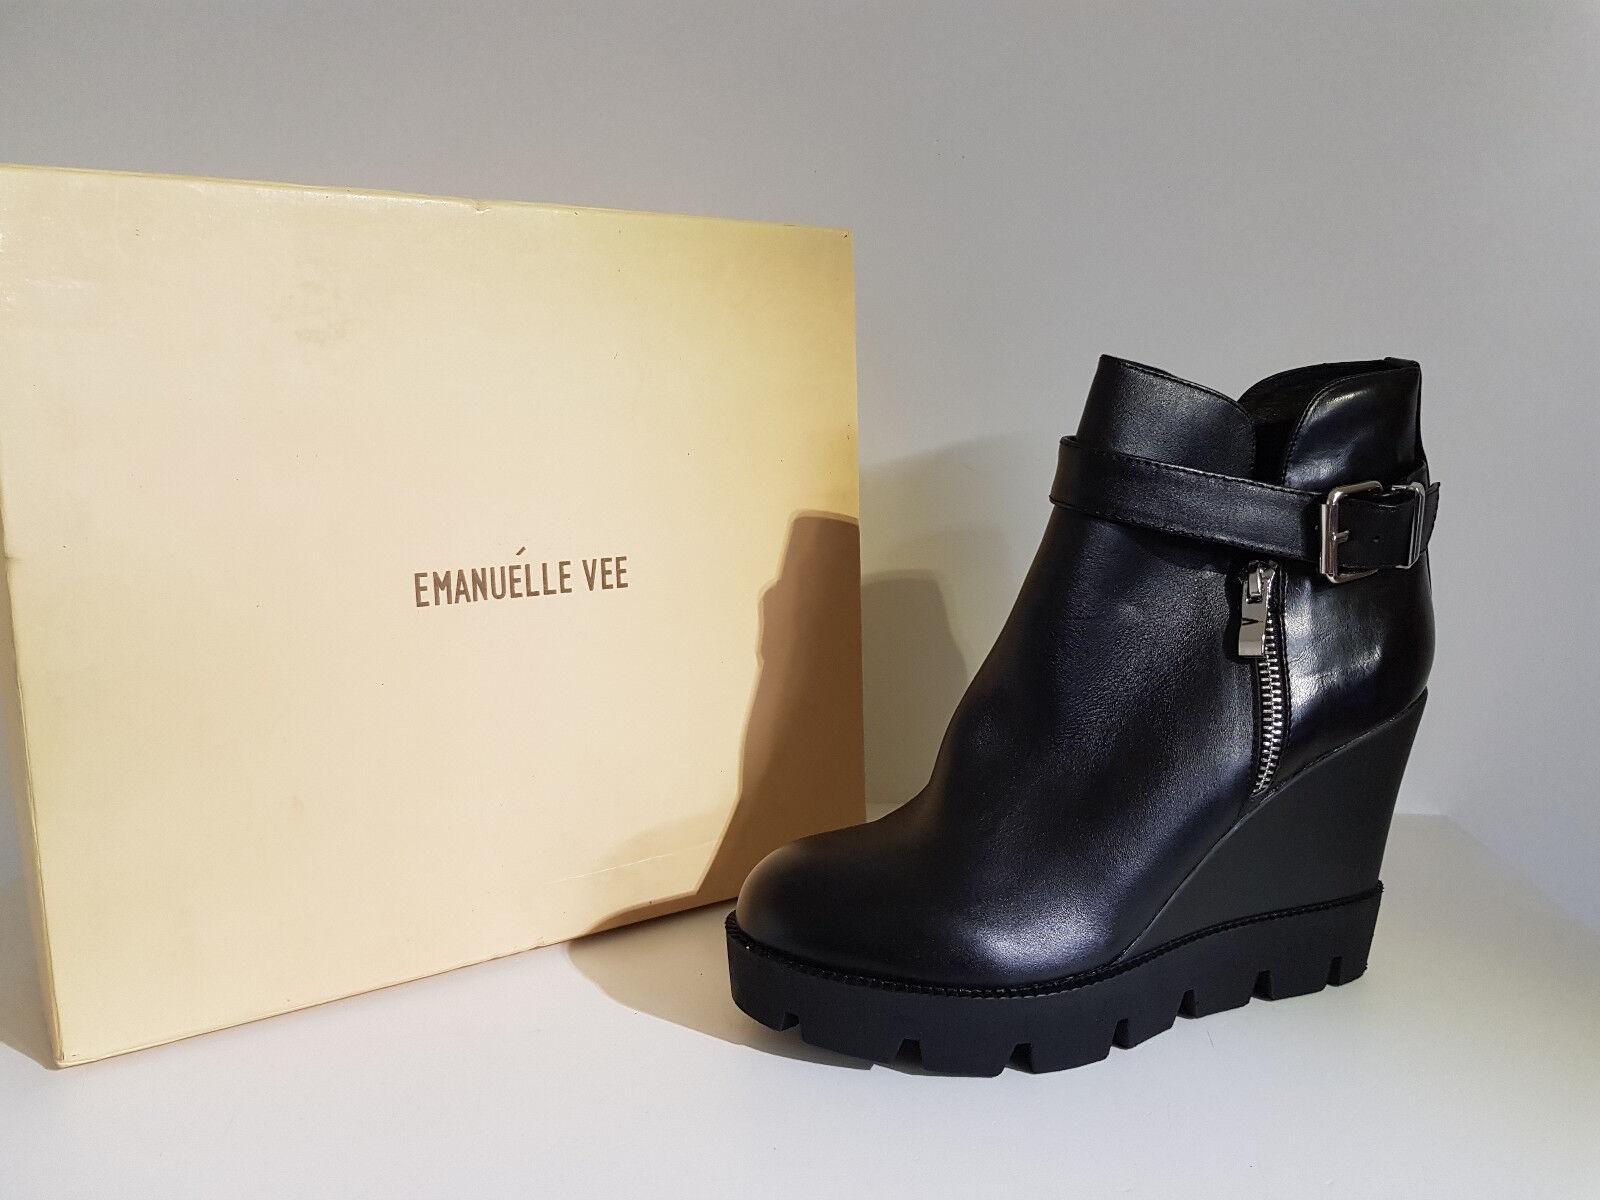 Frauen Stiefel Emanuelle Vee col.nero Rabatt. -55 % Art.452-719V5 col.nero Vee 7bd895